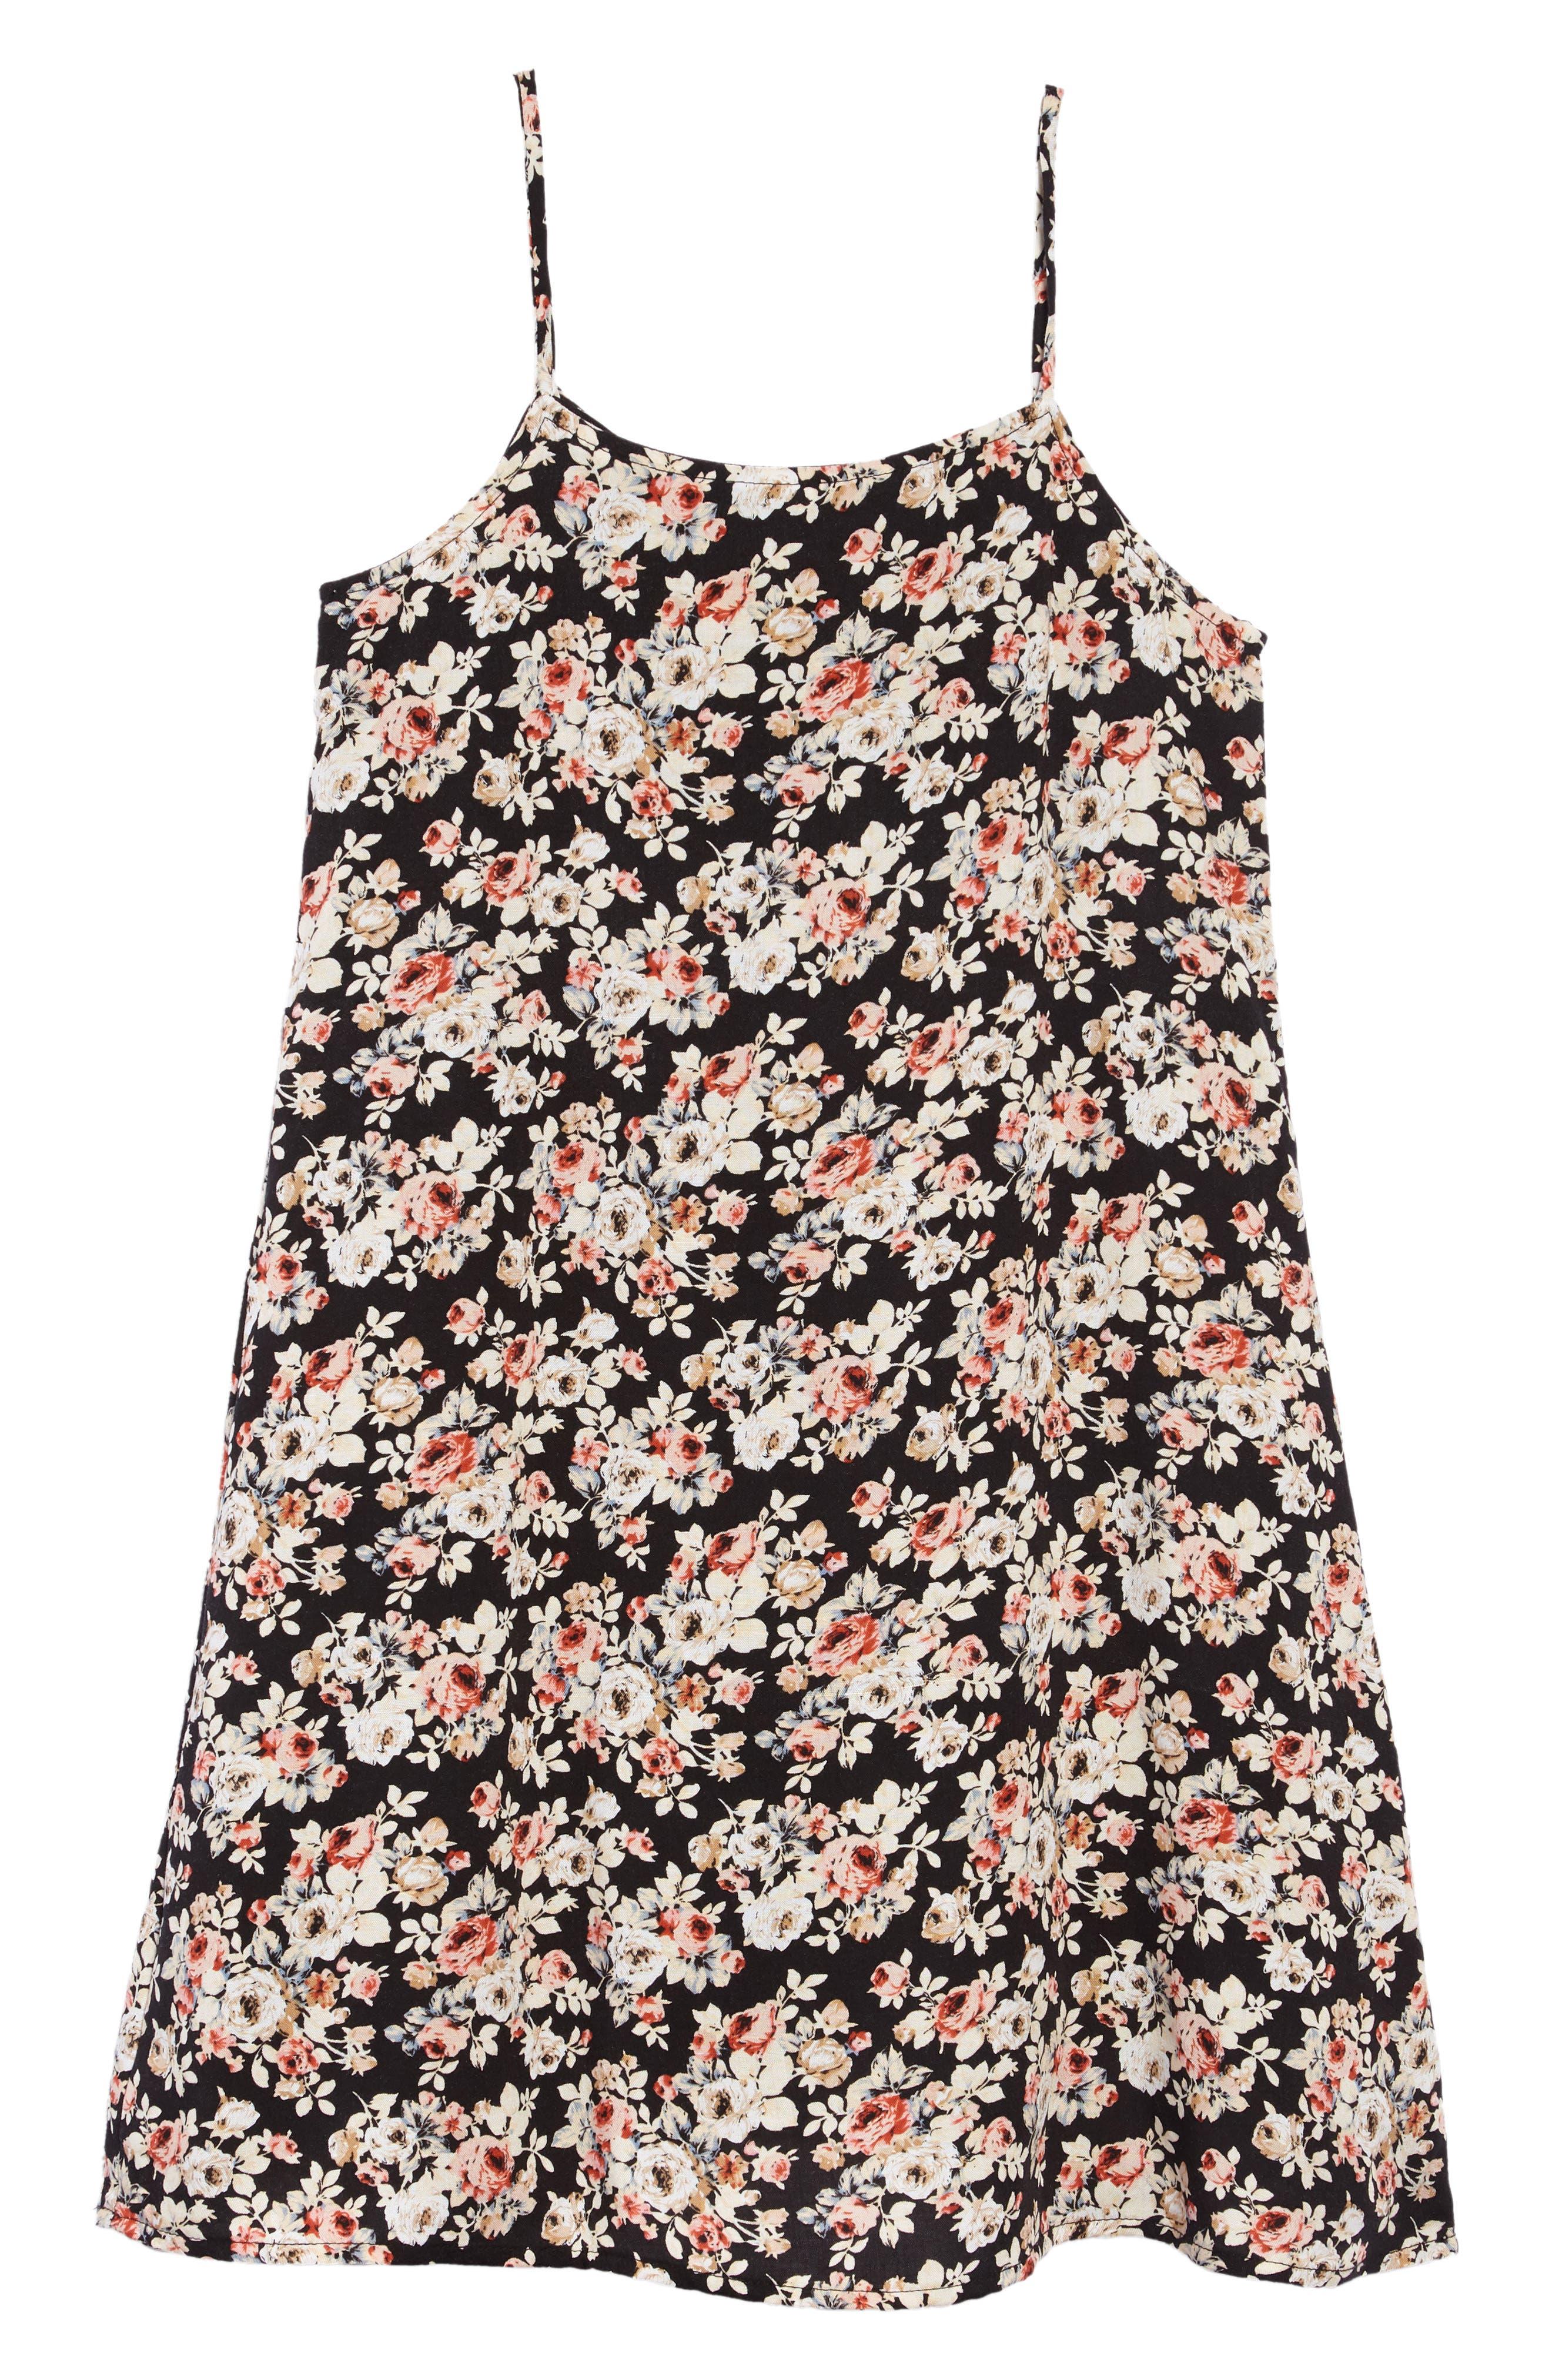 Floral Shift Dress,                             Alternate thumbnail 2, color,                             001